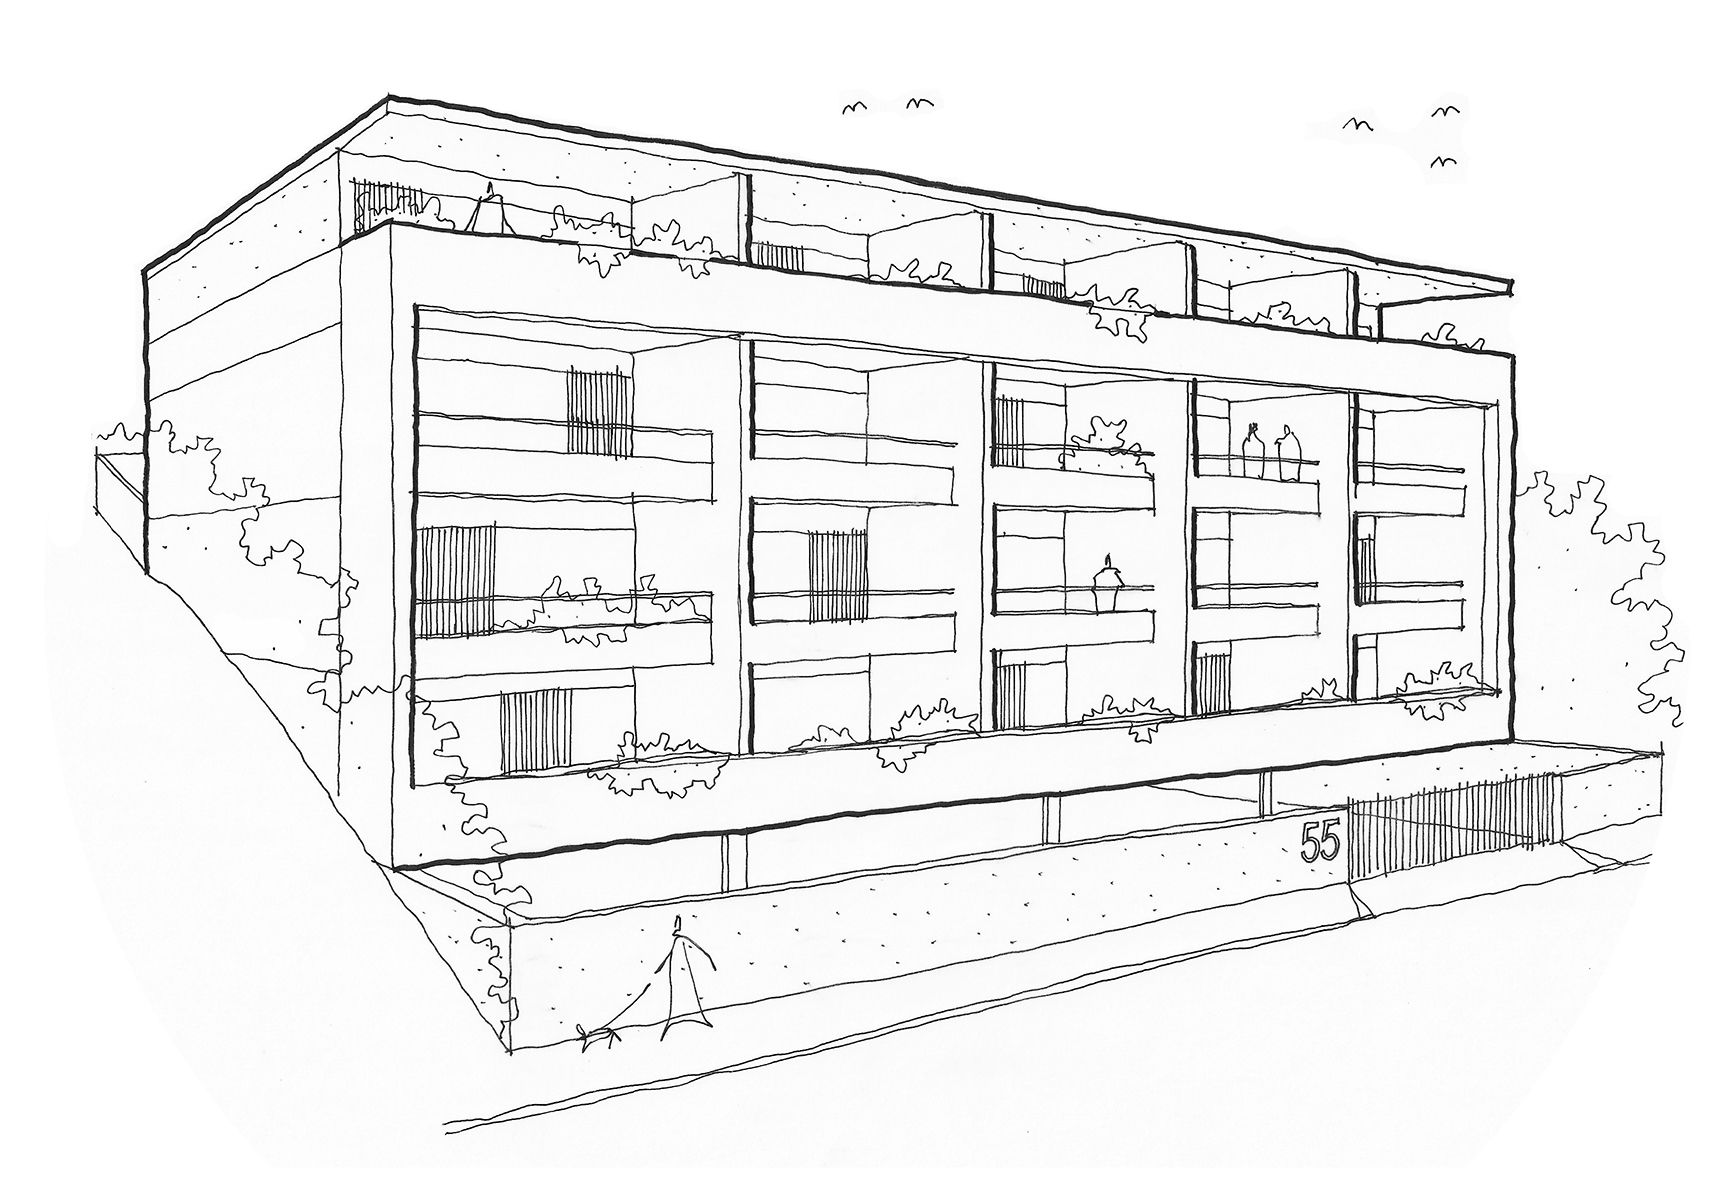 55HL sketch perspective B&W.jpg